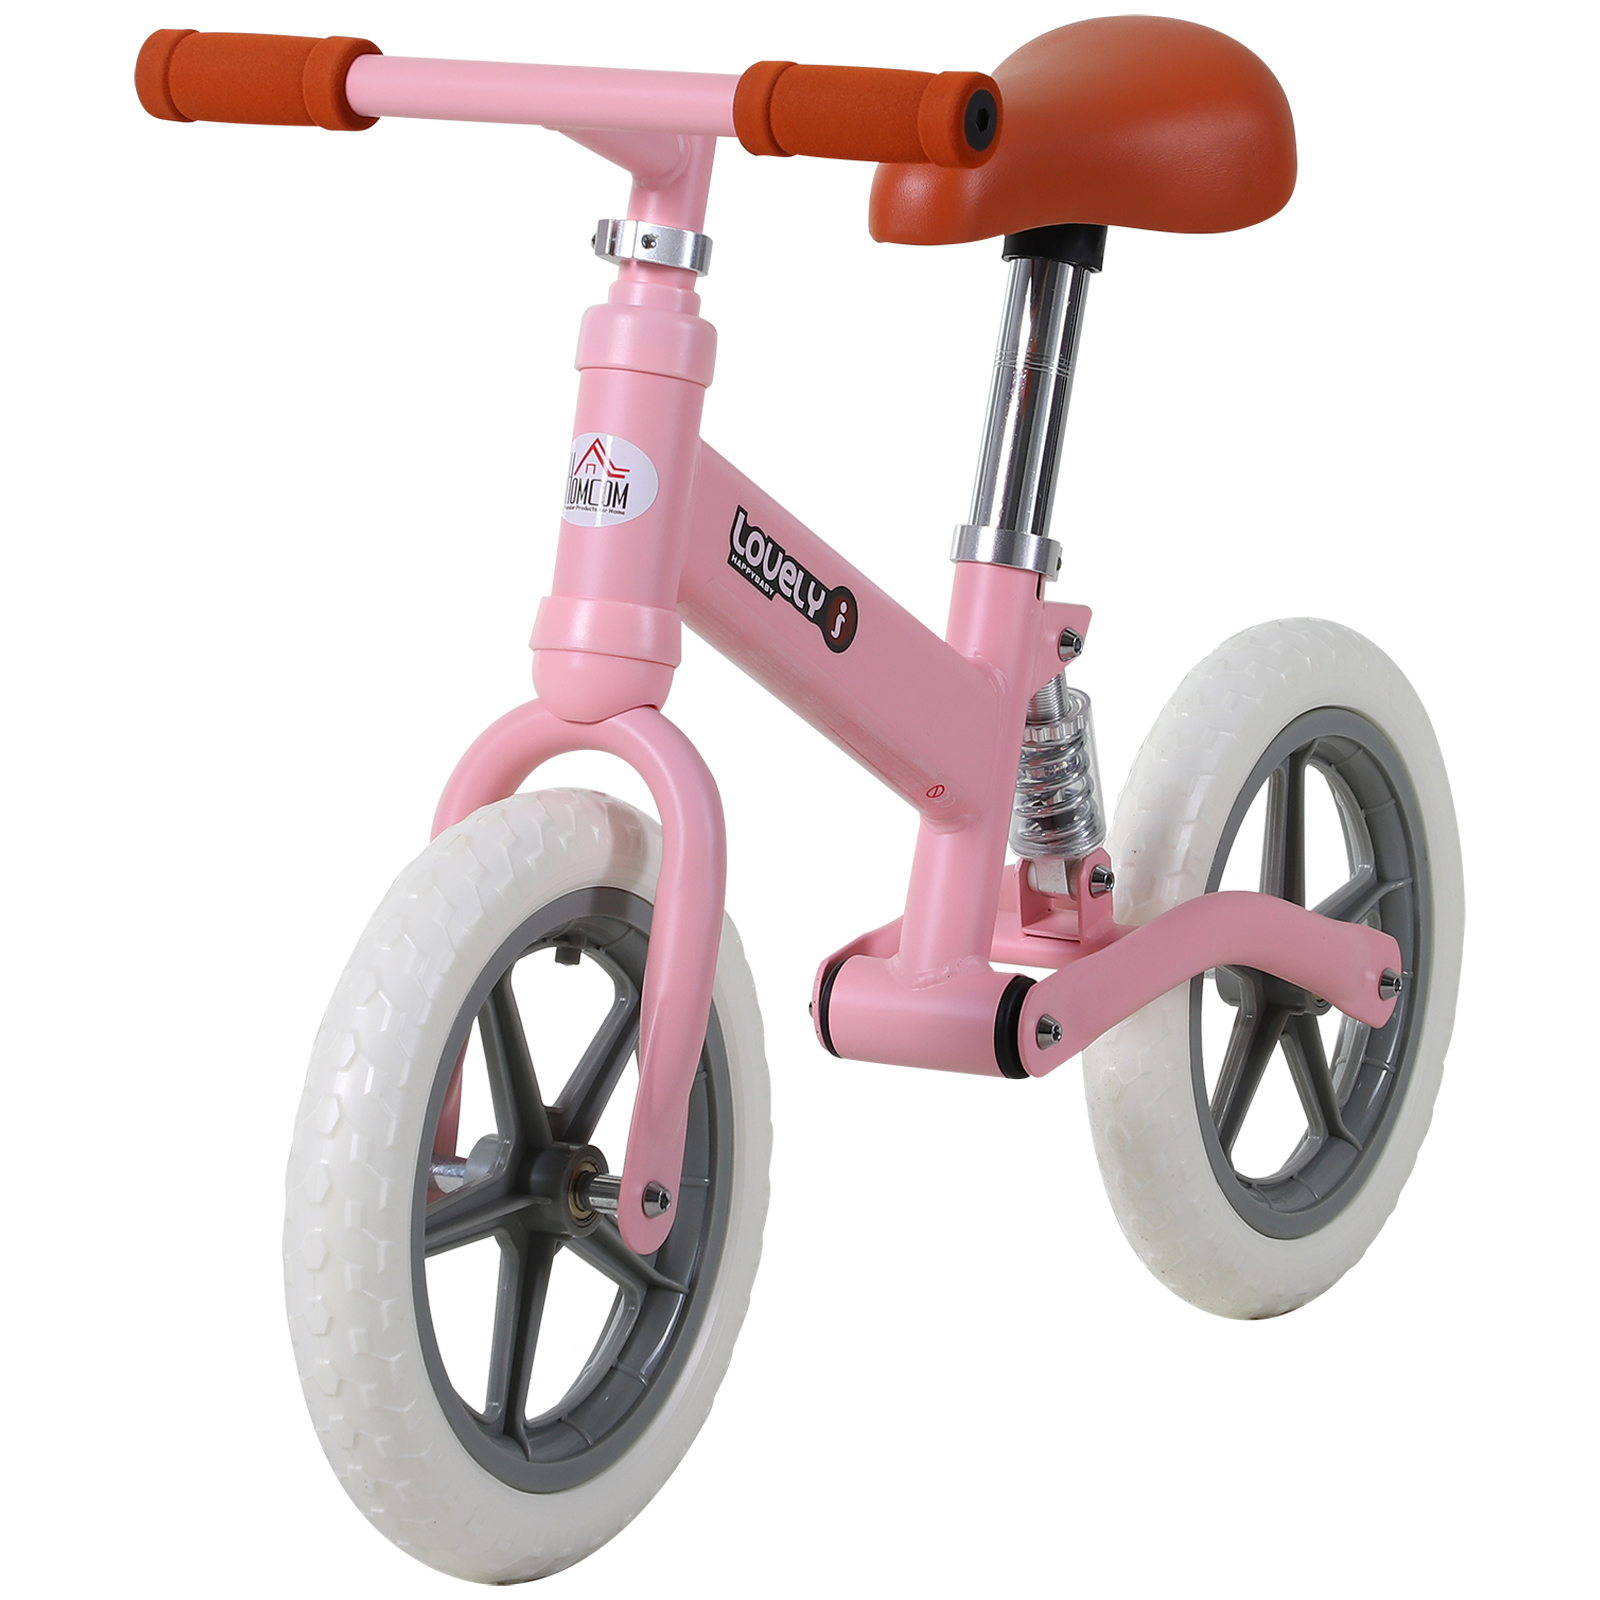 Indexbild 25 - HOMCOM Laufrad mit Stoßdämpfer Kinderrad Lauflernrad Balance Bike 2-5 Jahre